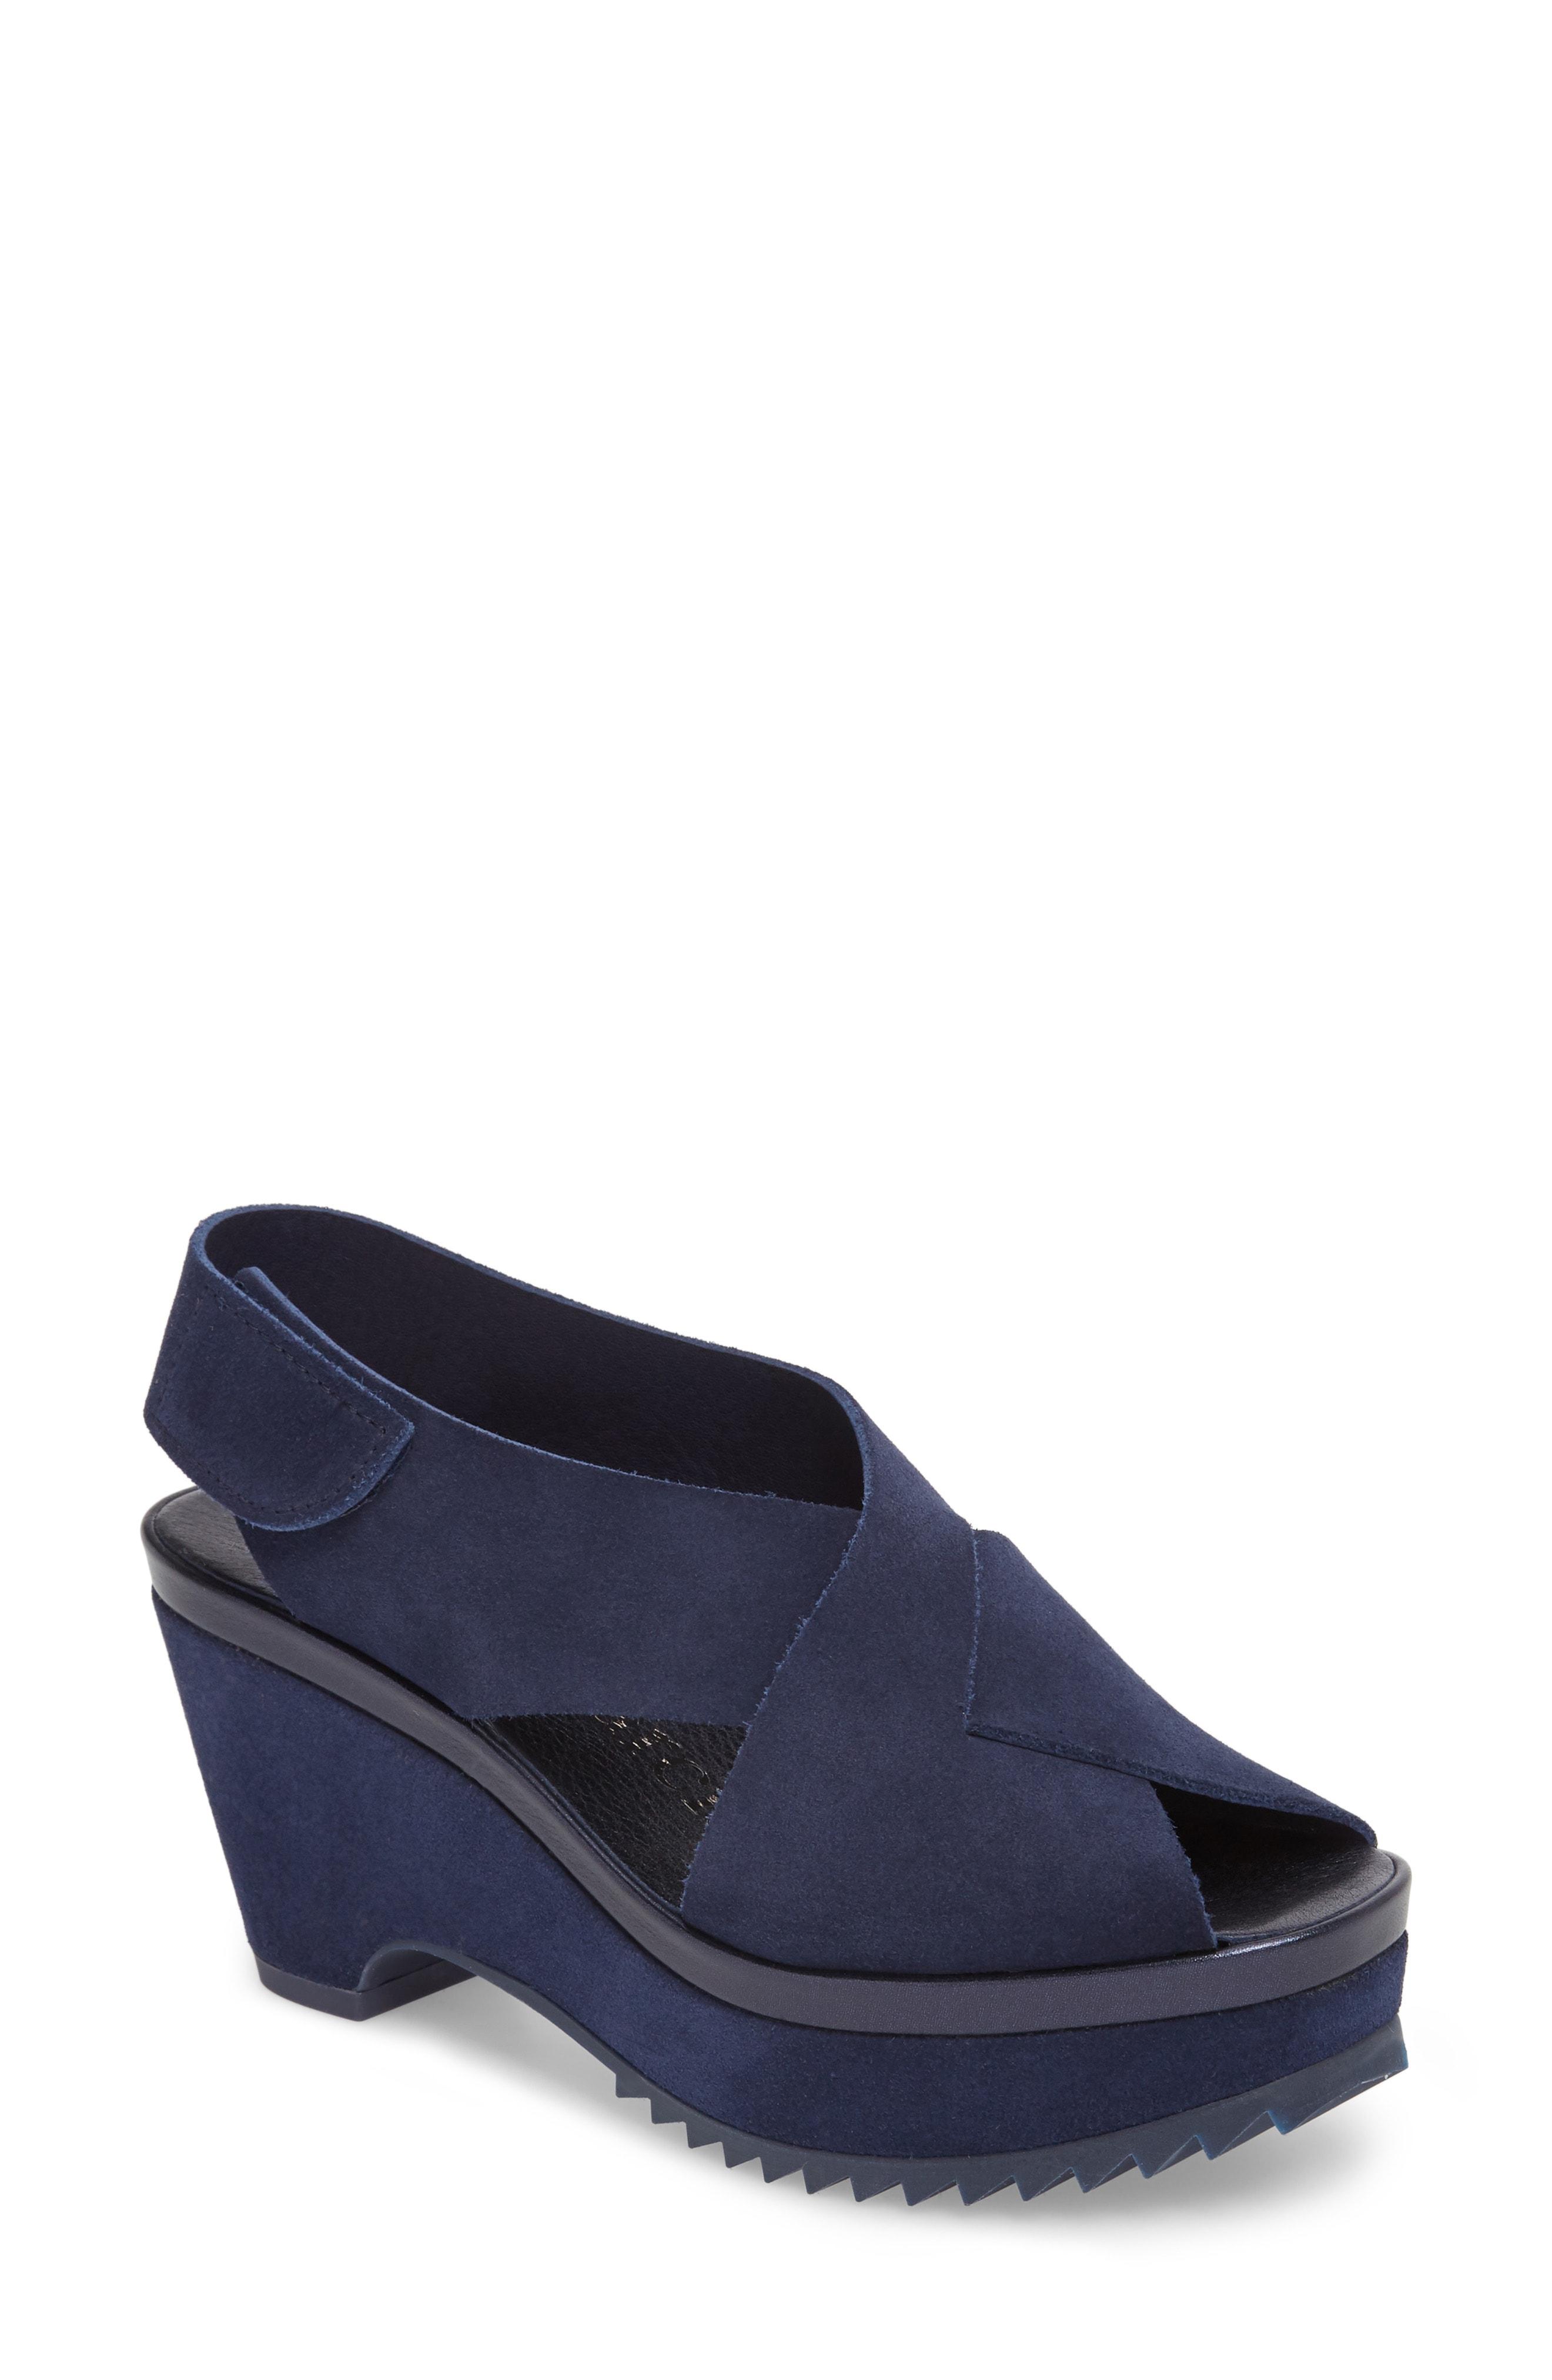 Pedro Garcia Women's Shoes | Nordstrom